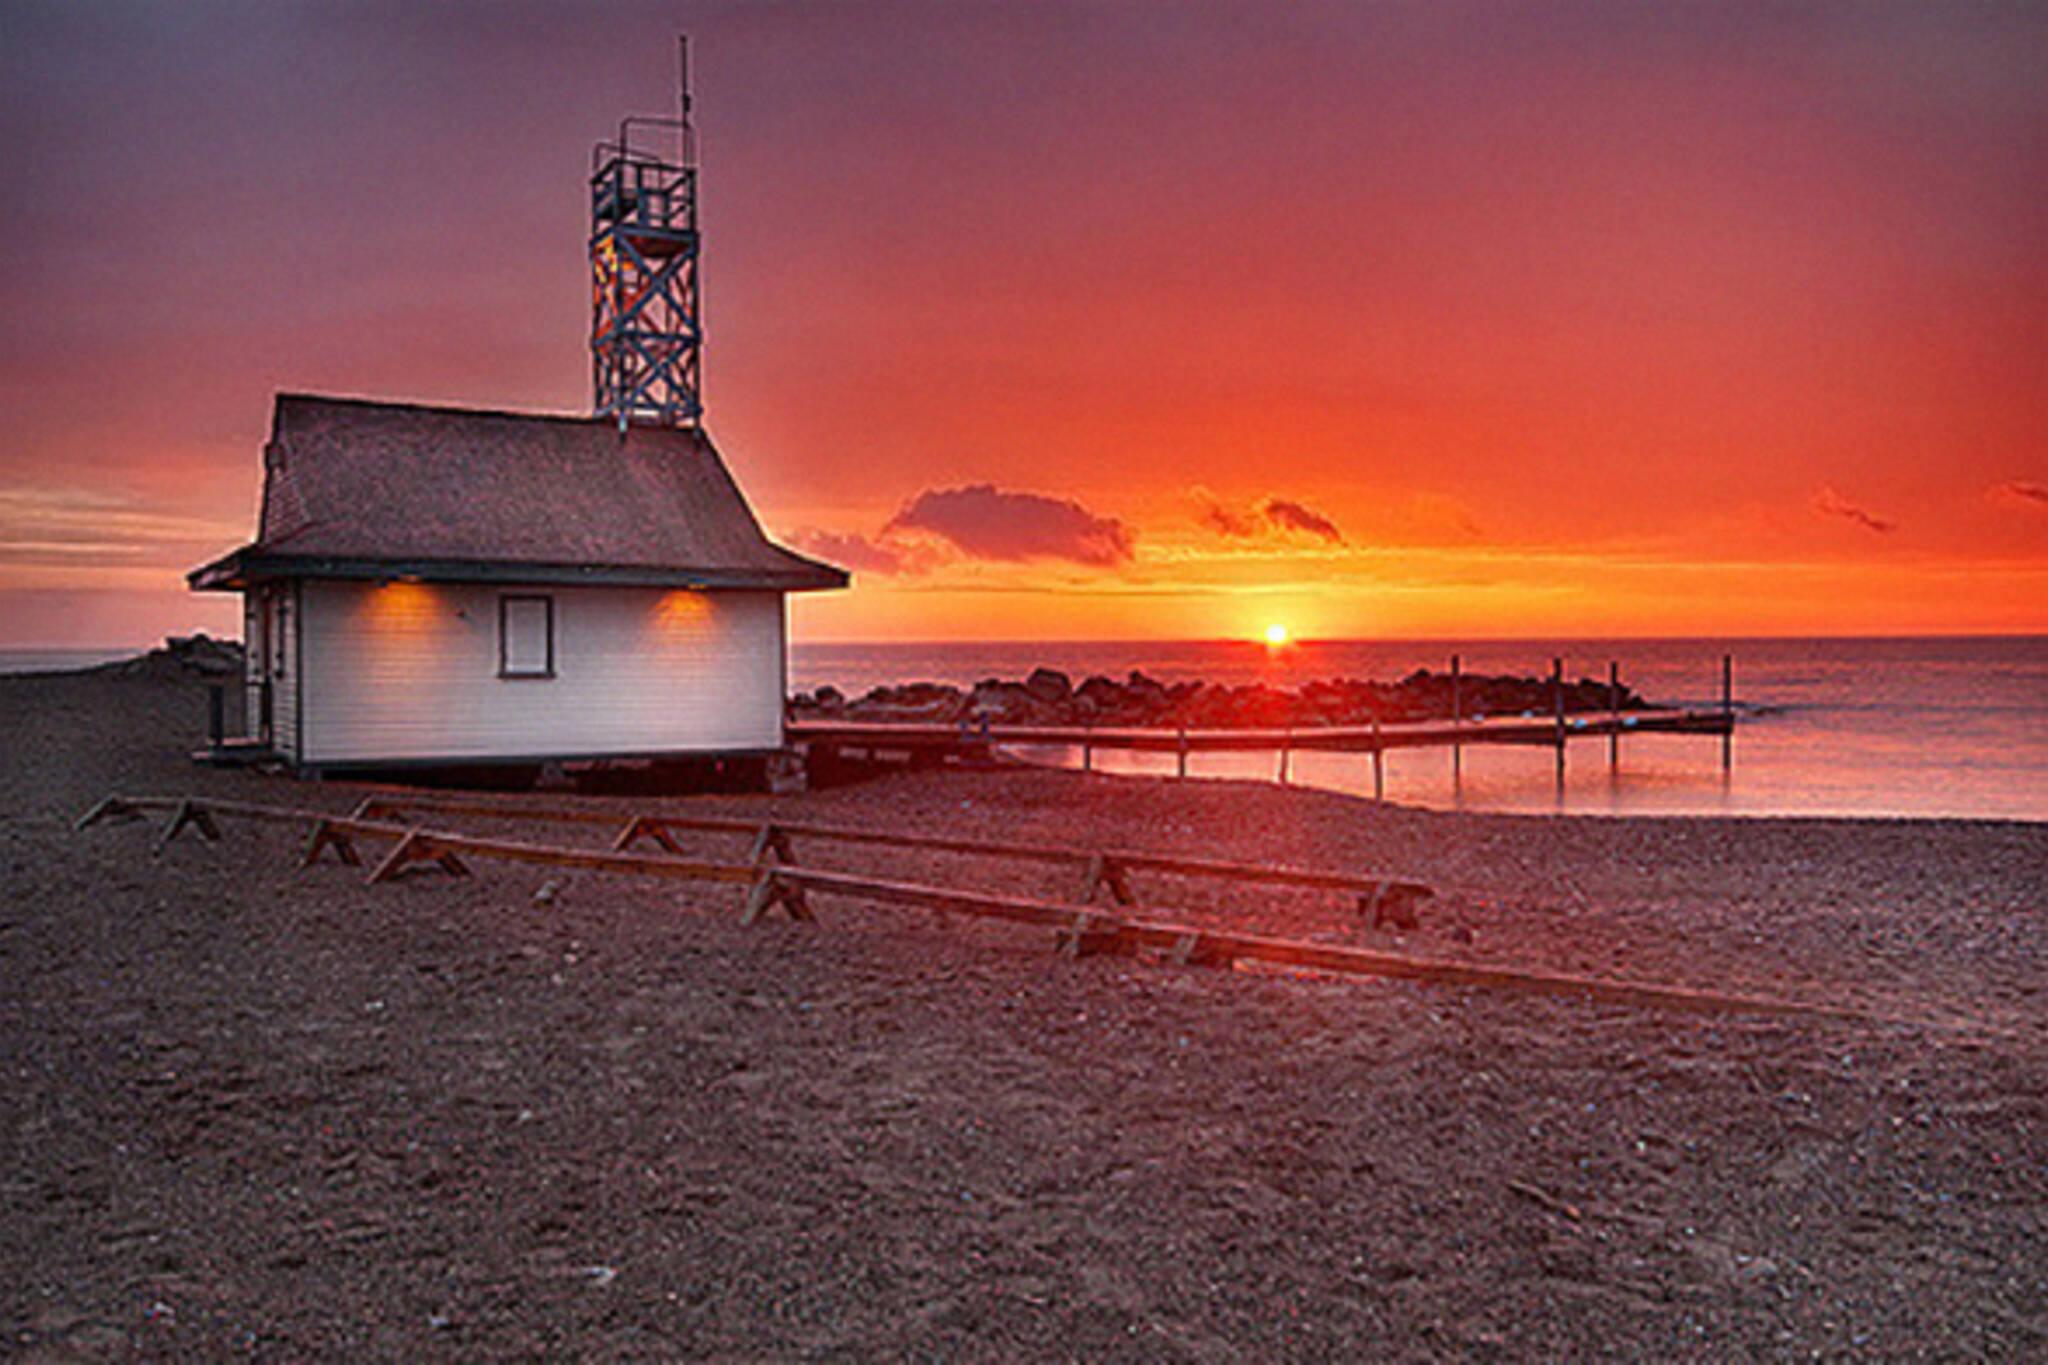 sunrise toronto